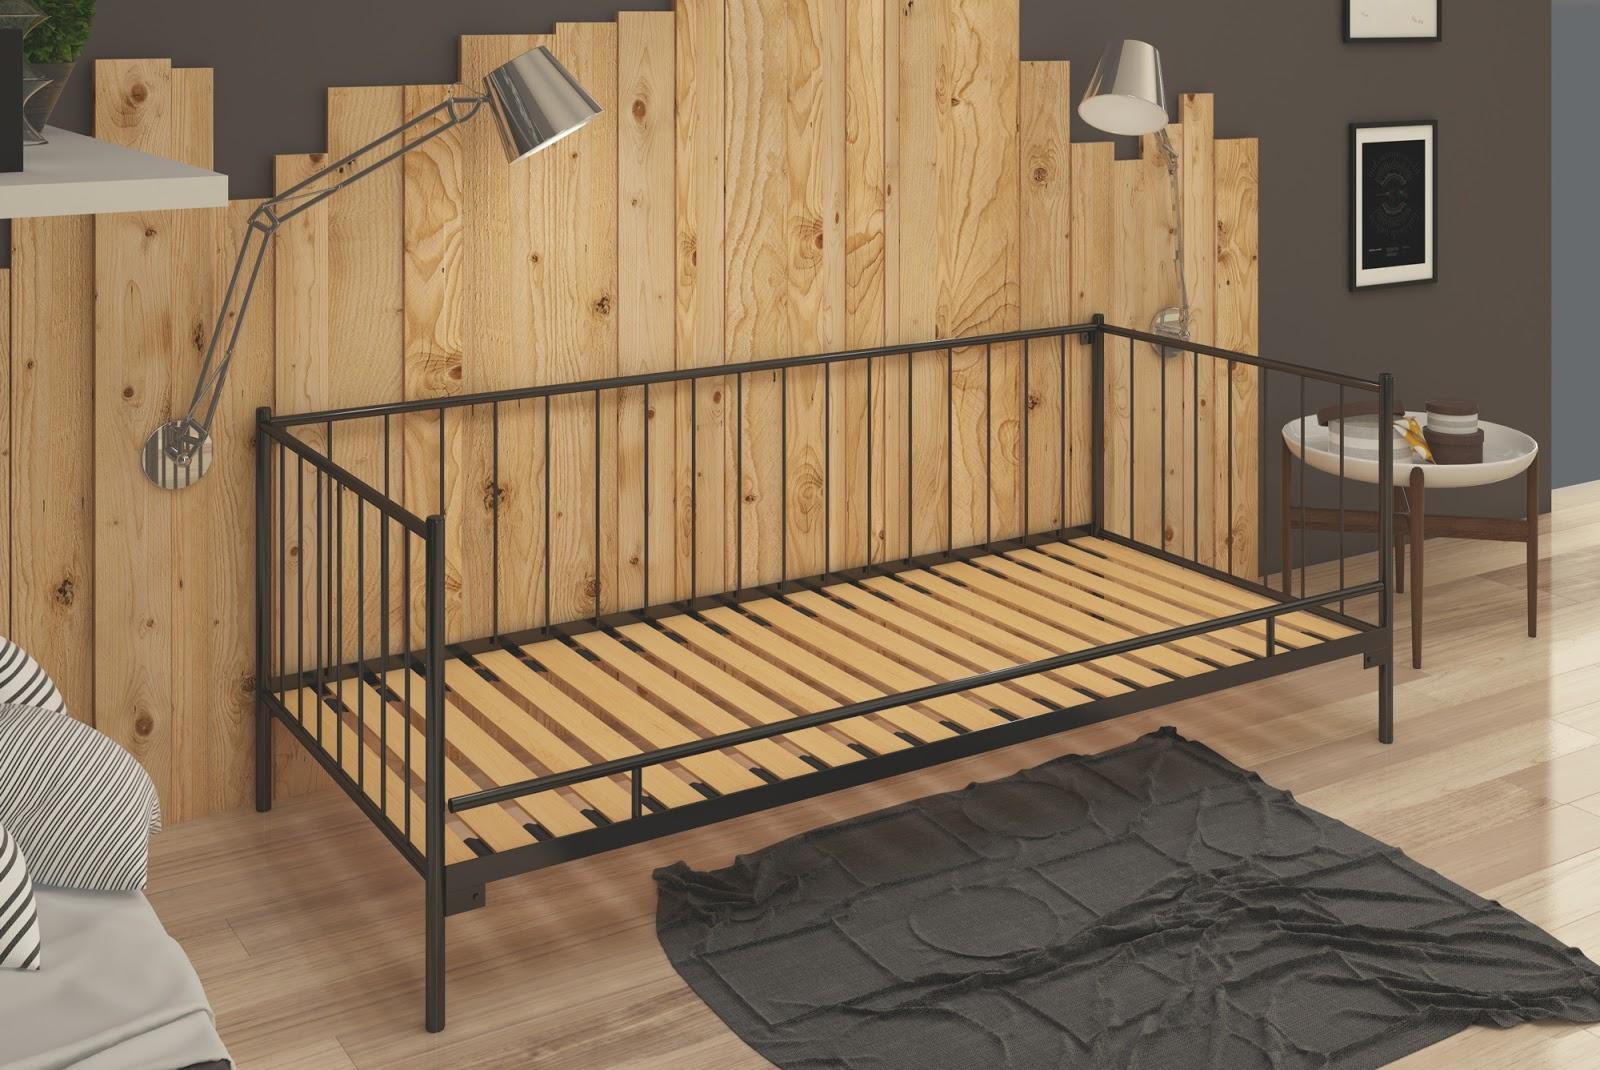 Łóżko metalowe sofa wzór 3